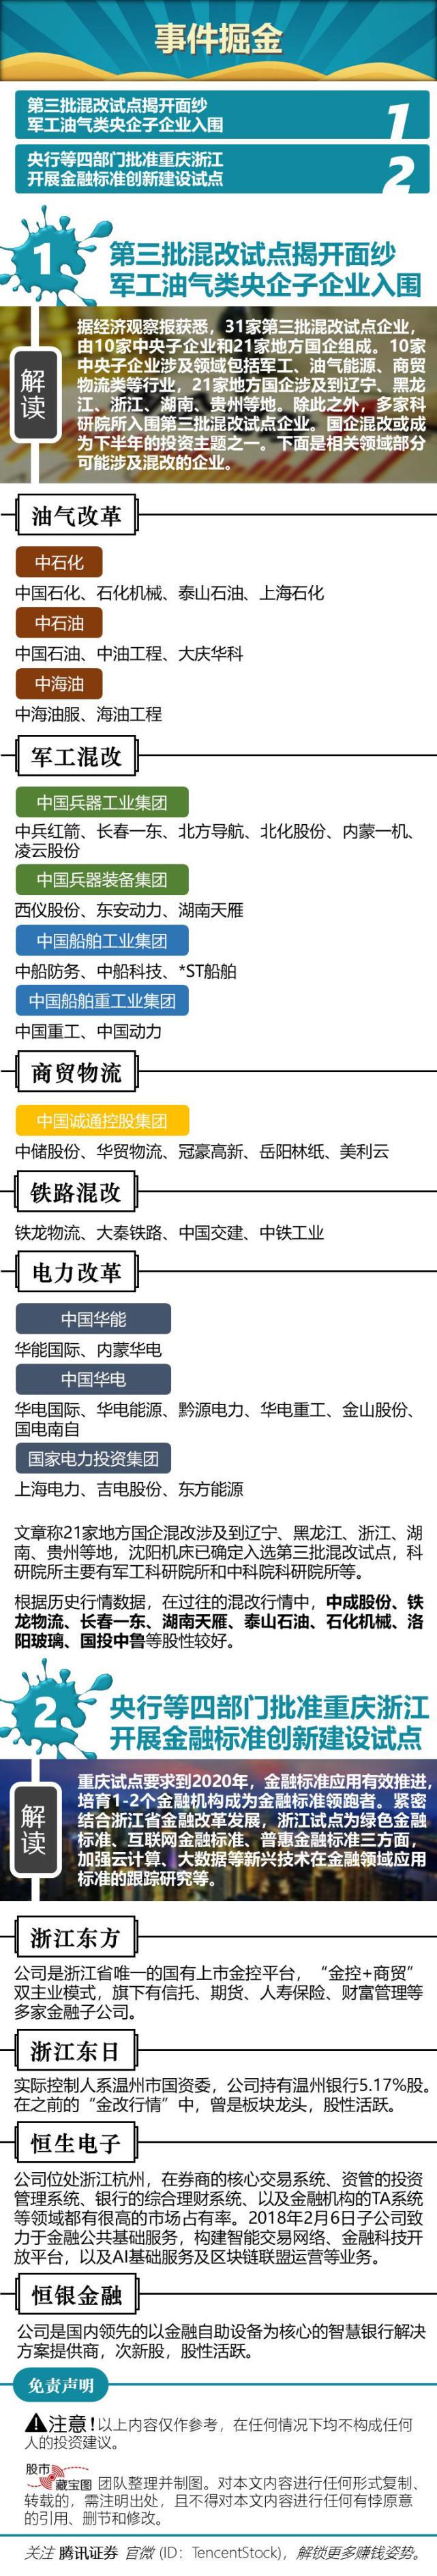 http://mp.cnfol.com/article/1657896